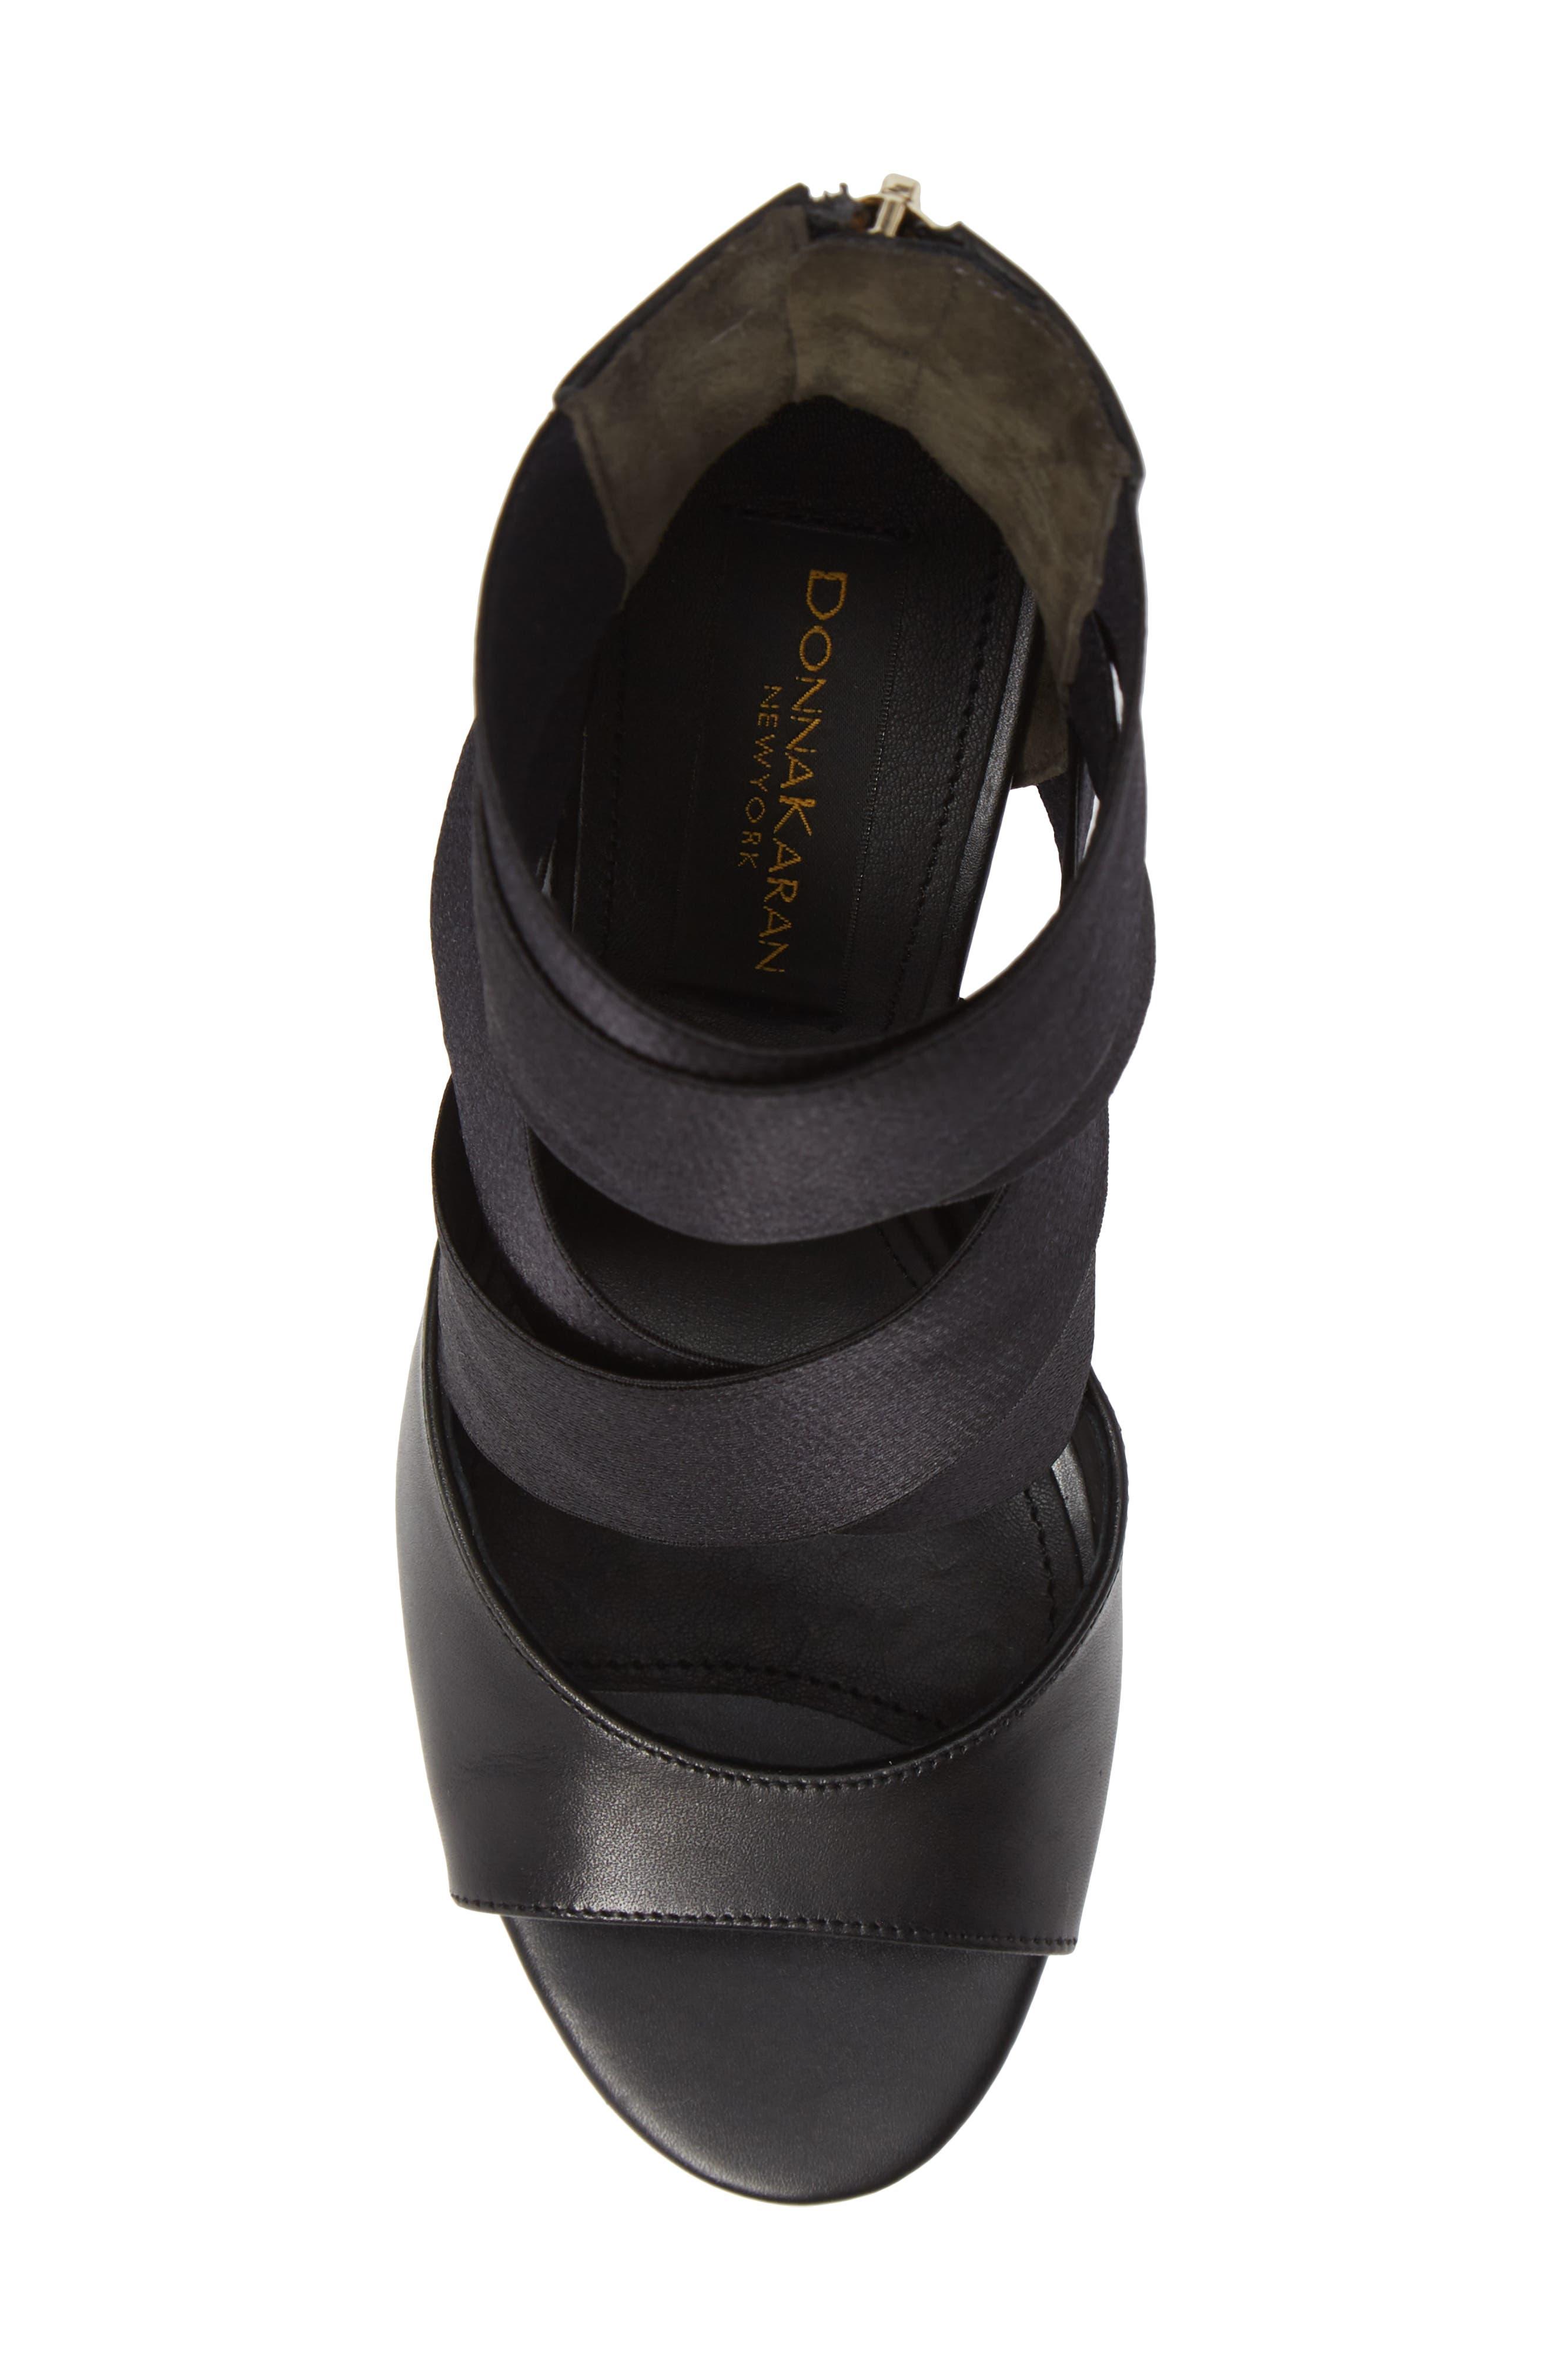 Donna Karan Briana Strappy High Sandal,                             Alternate thumbnail 5, color,                             BLACK CALF SHINY SATIN ELASTIC